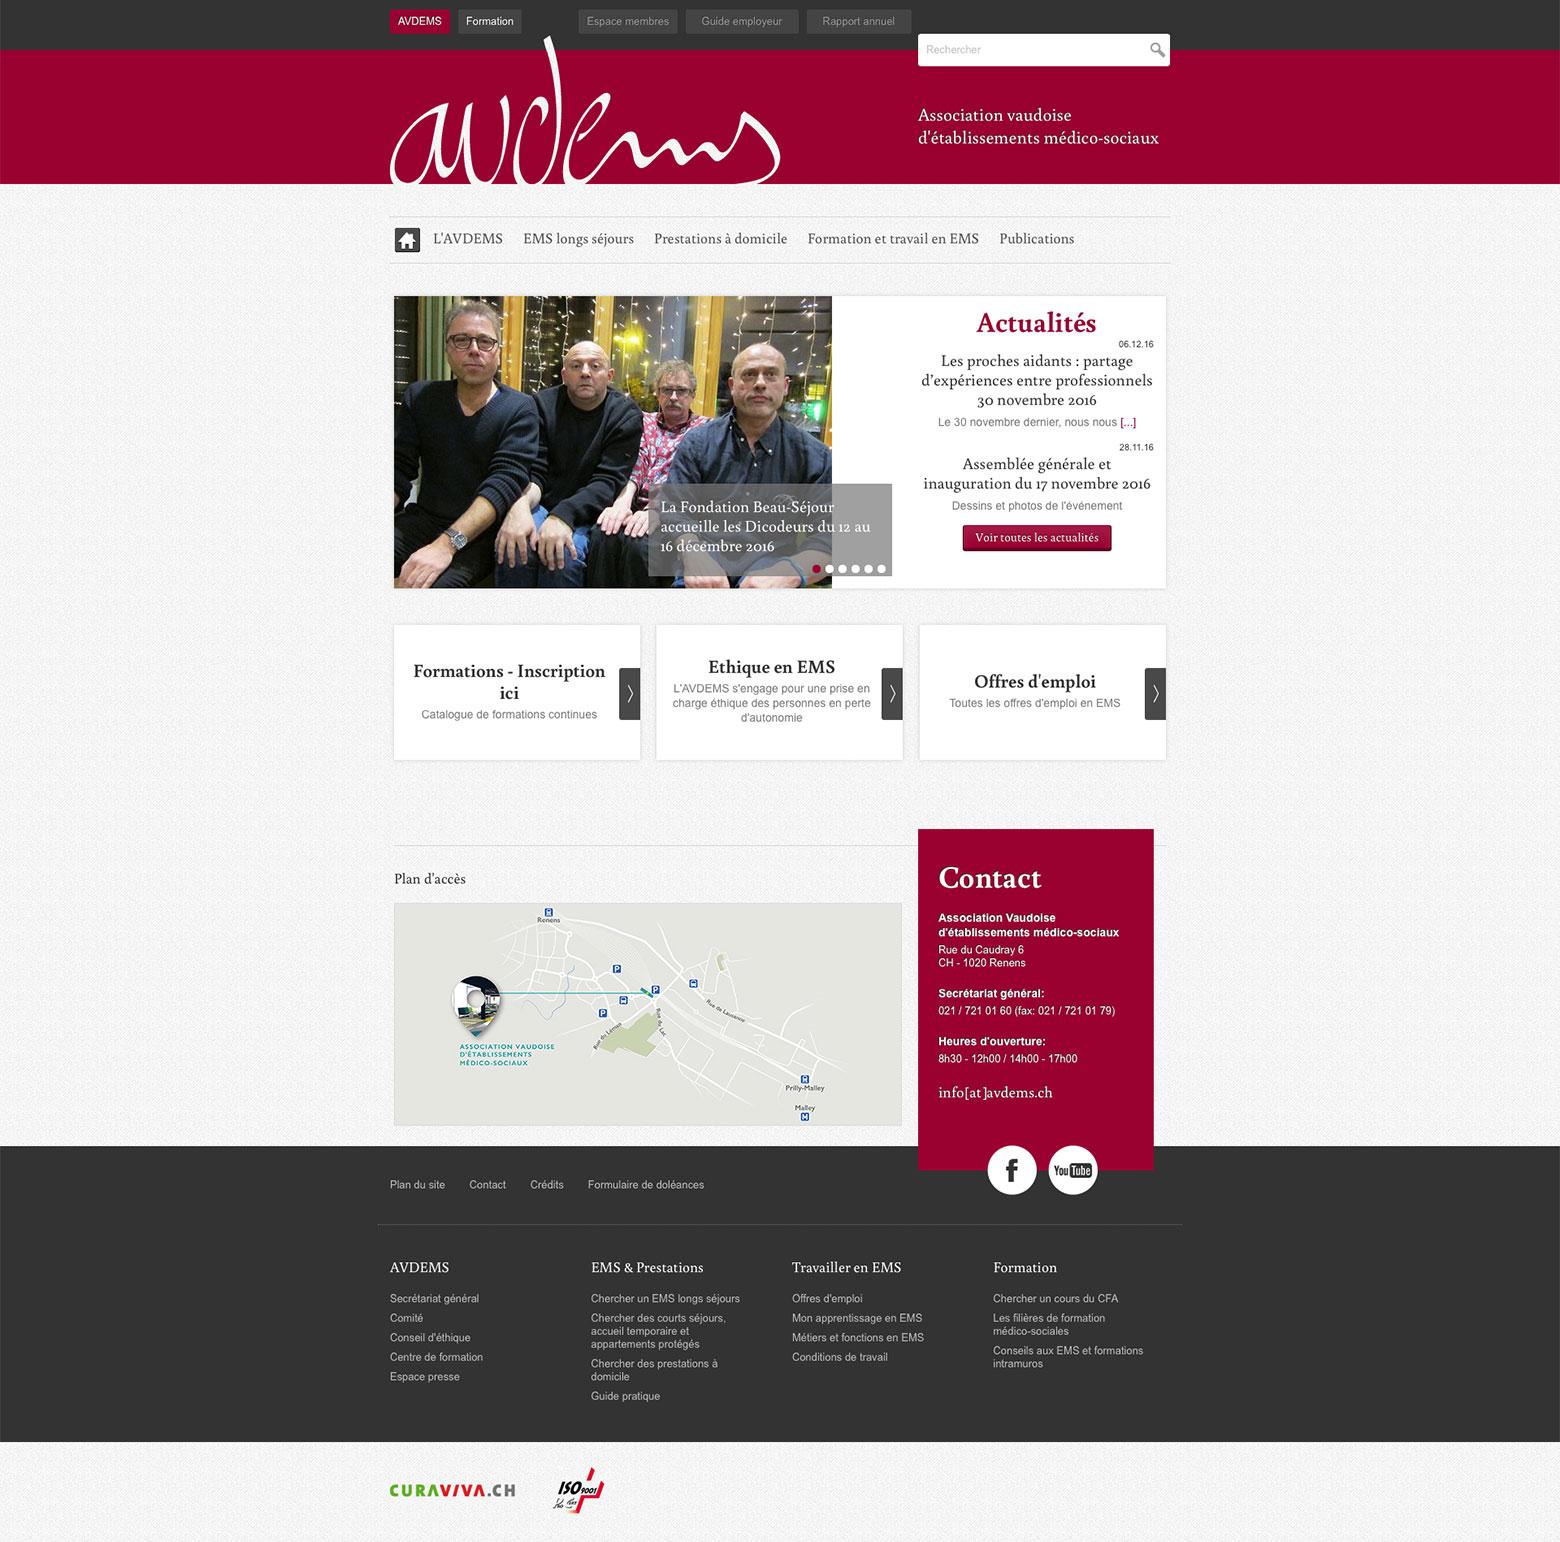 AVDEMS WNG Agence Digitale